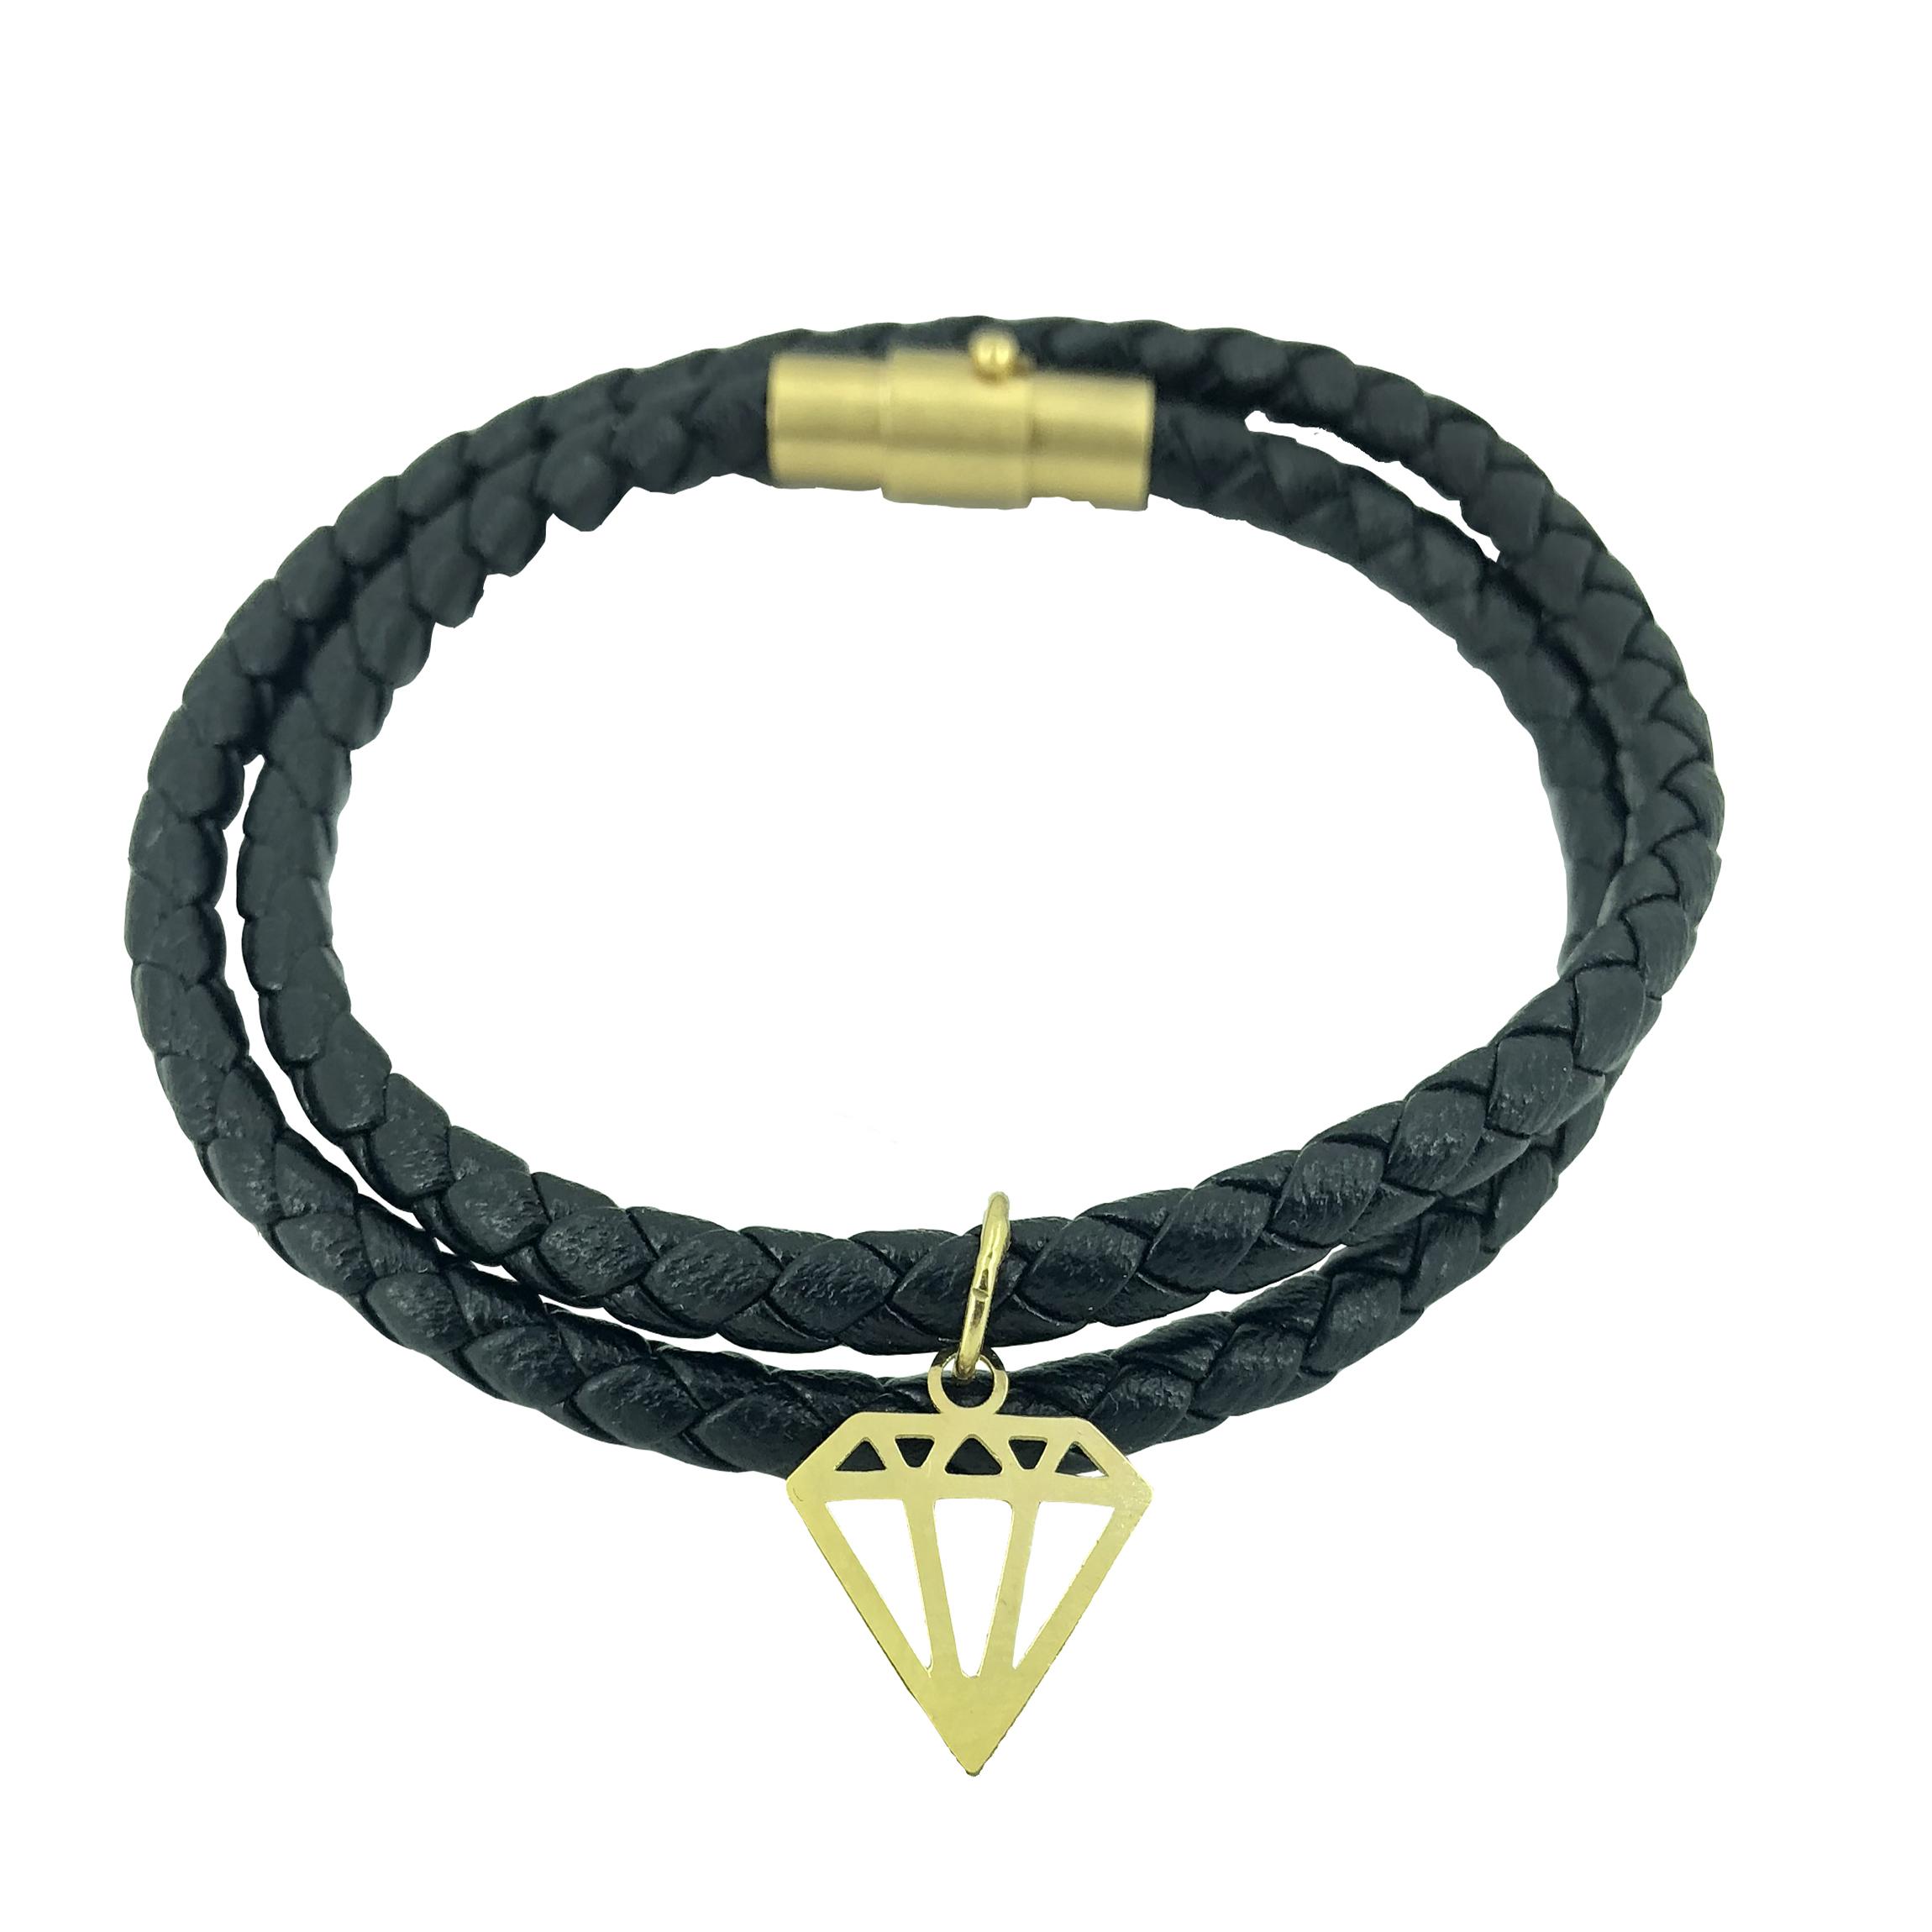 دستبند طلا 18 عیار طرح الماس مدل G308